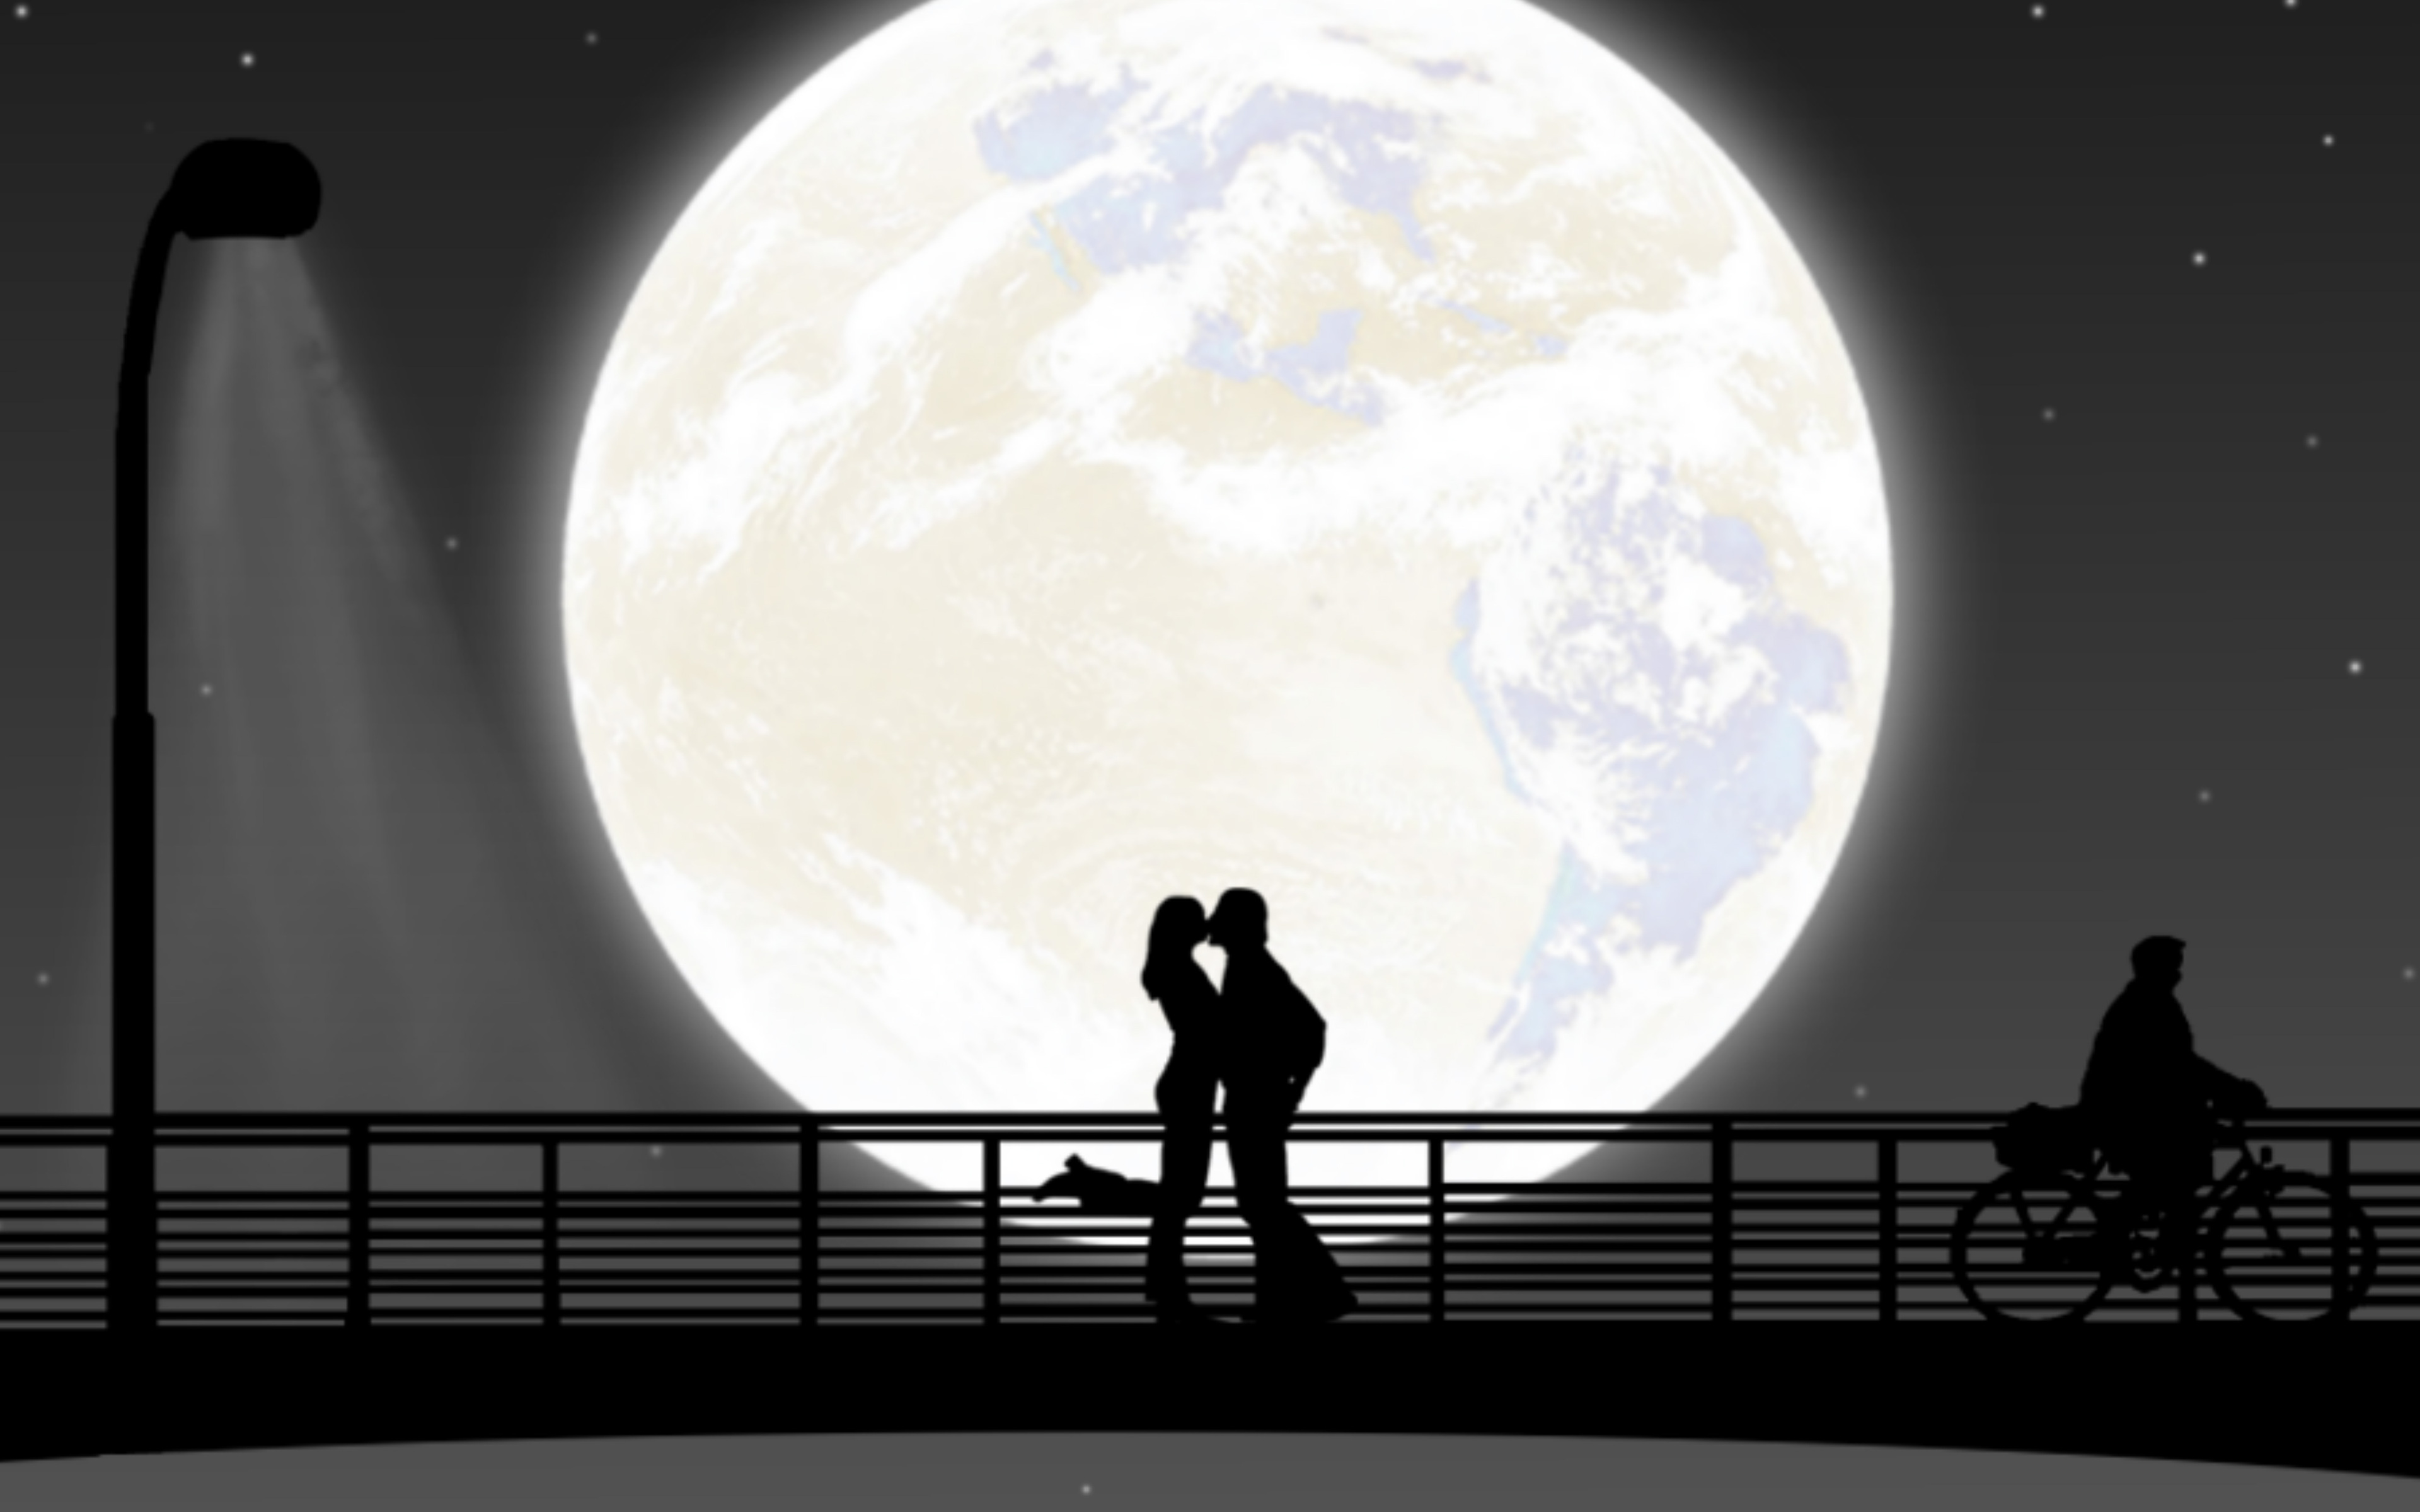 full-moon-night-couple-kiss-j3.jpg